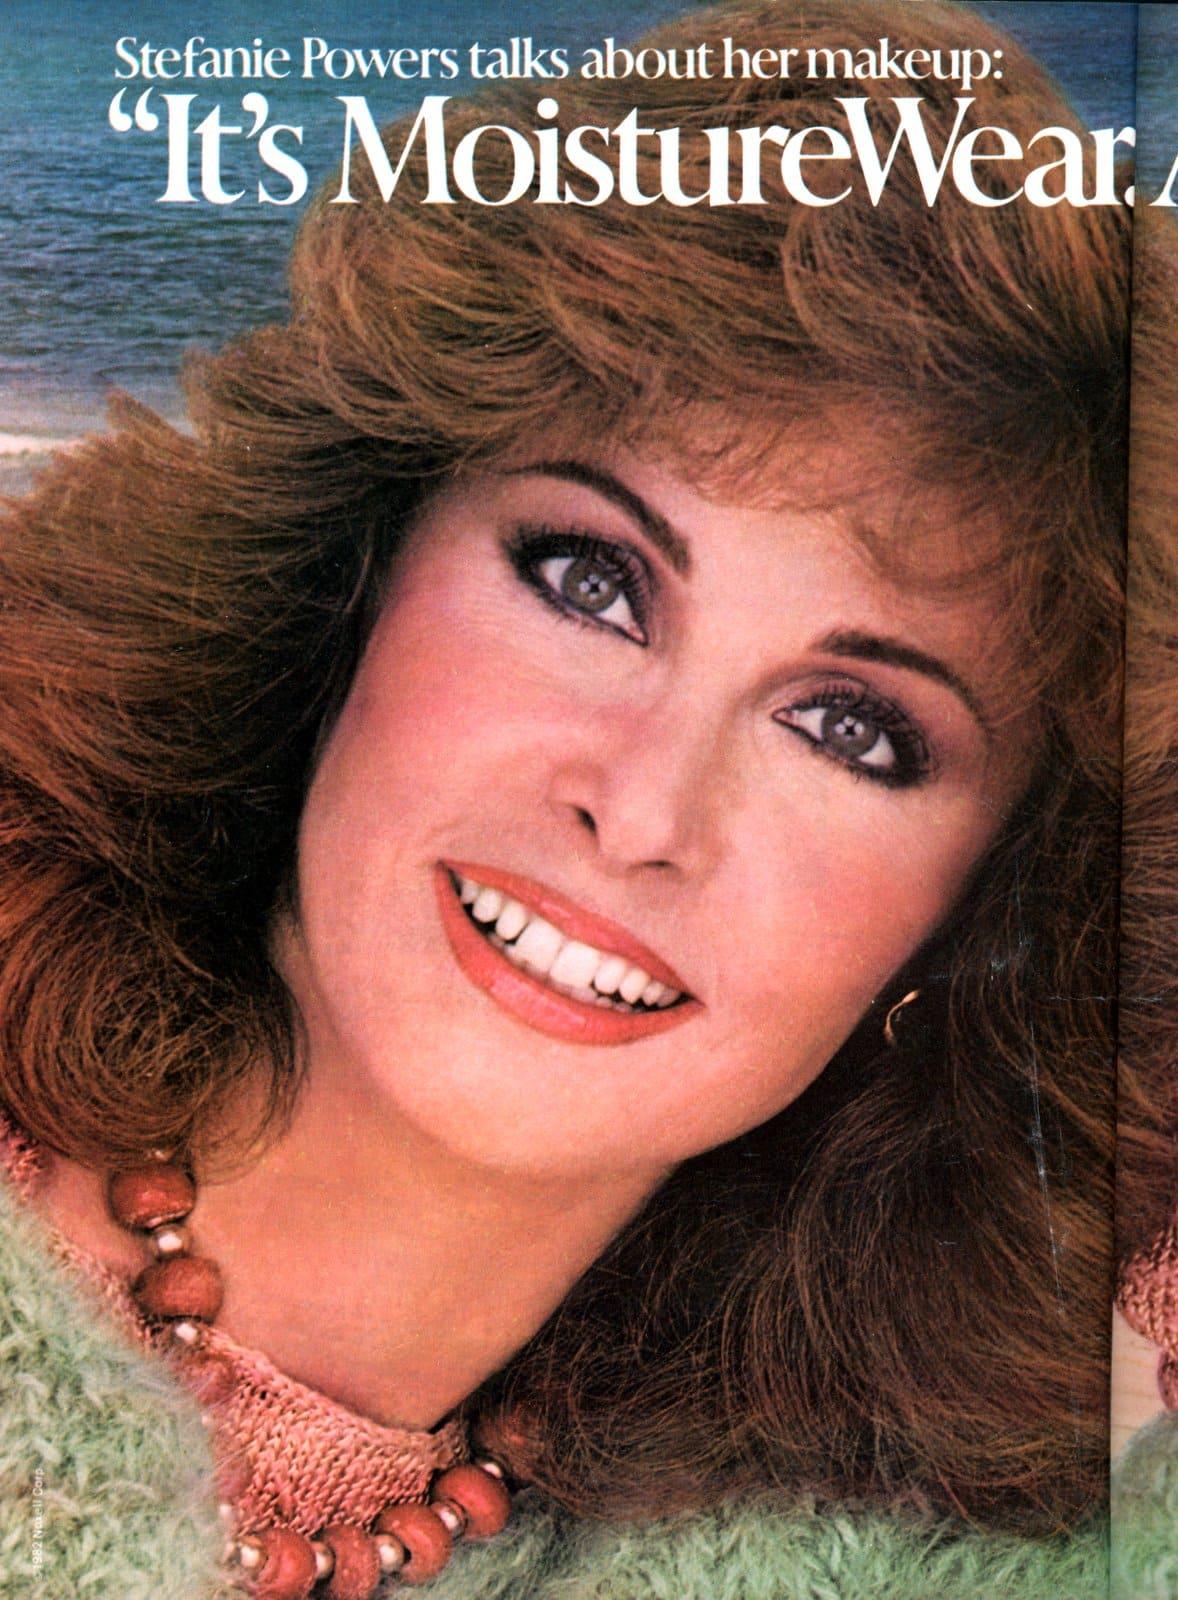 Stefanie Powers for Cover Girl (1982)